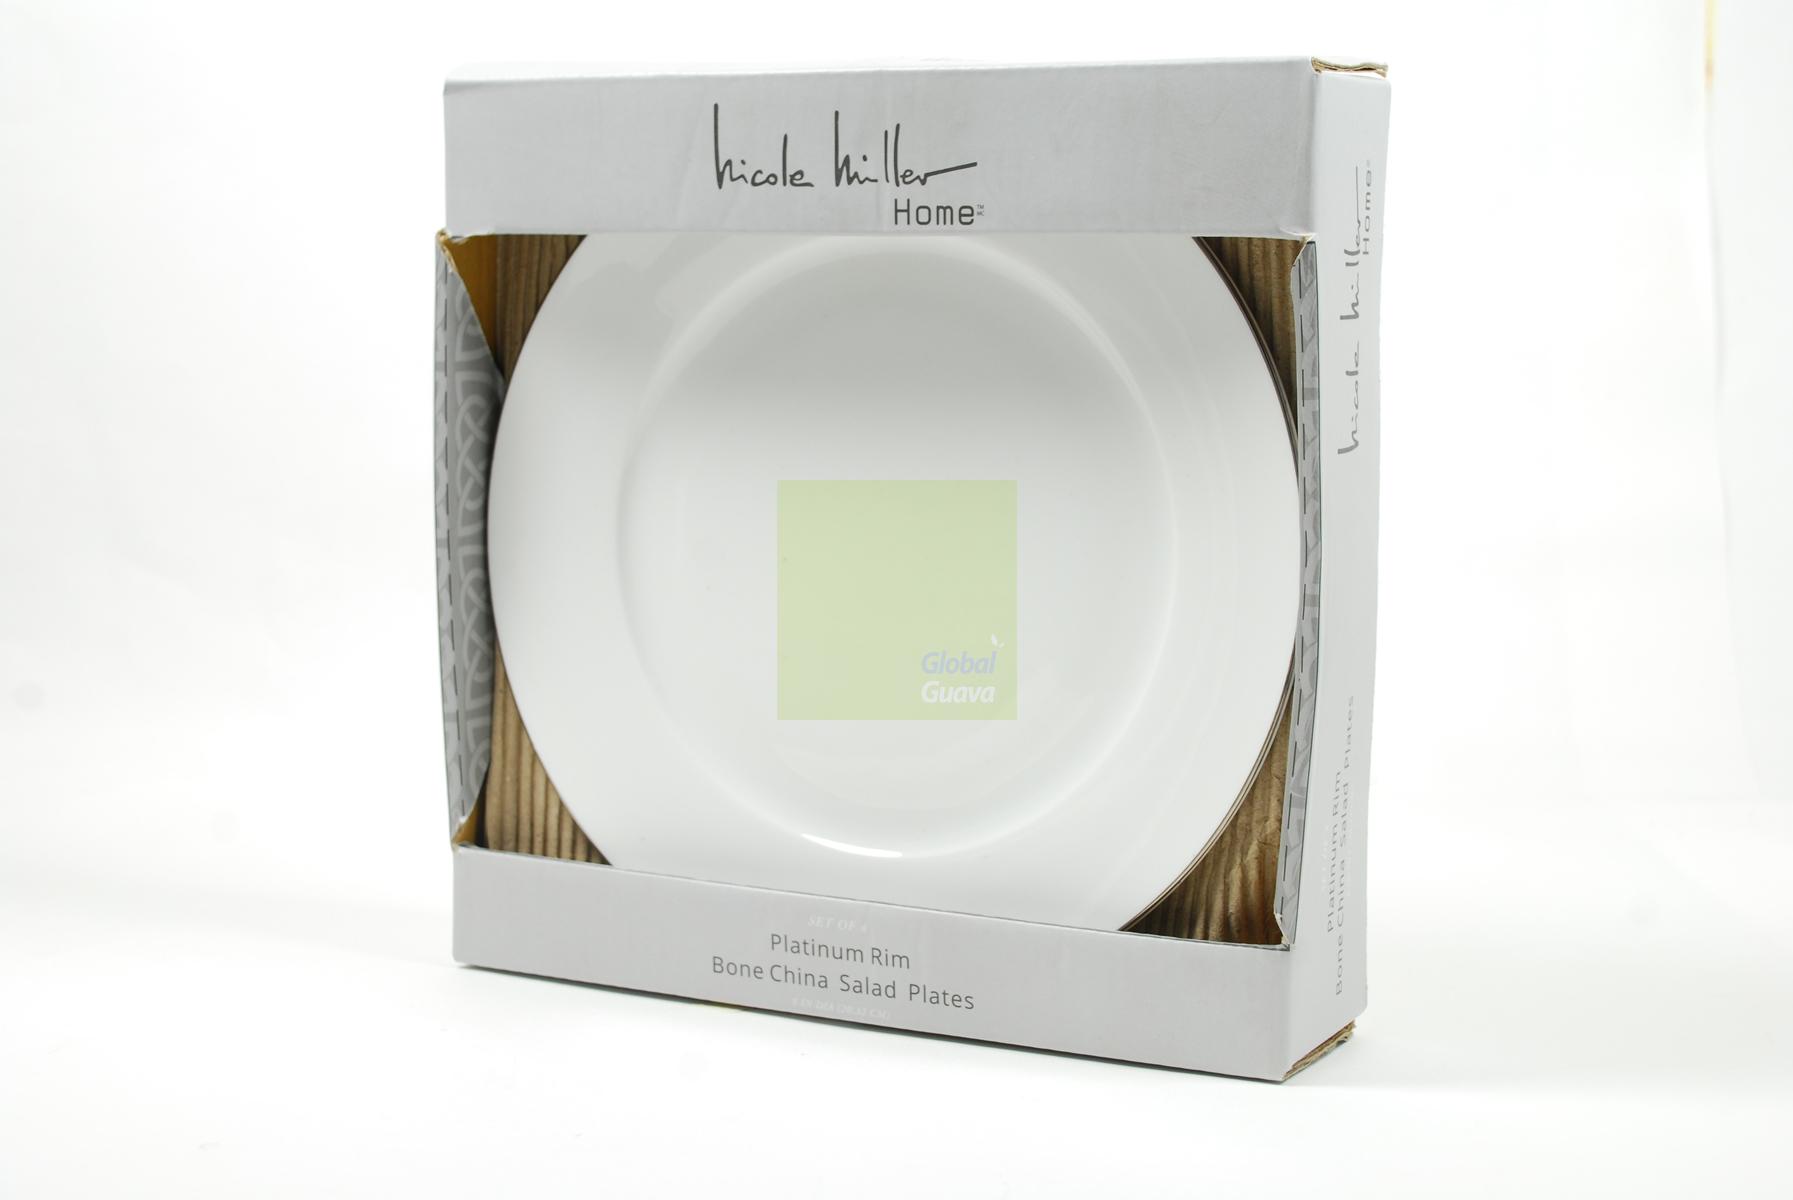 NICOLE MILLER HOME Set of 4 Platinum Rim Bone China 8\  White Salad Plates  sc 1 st  Global Guava & Dinner and Drinks All On Nicole Miller Ralph Lauren and Nambé ...